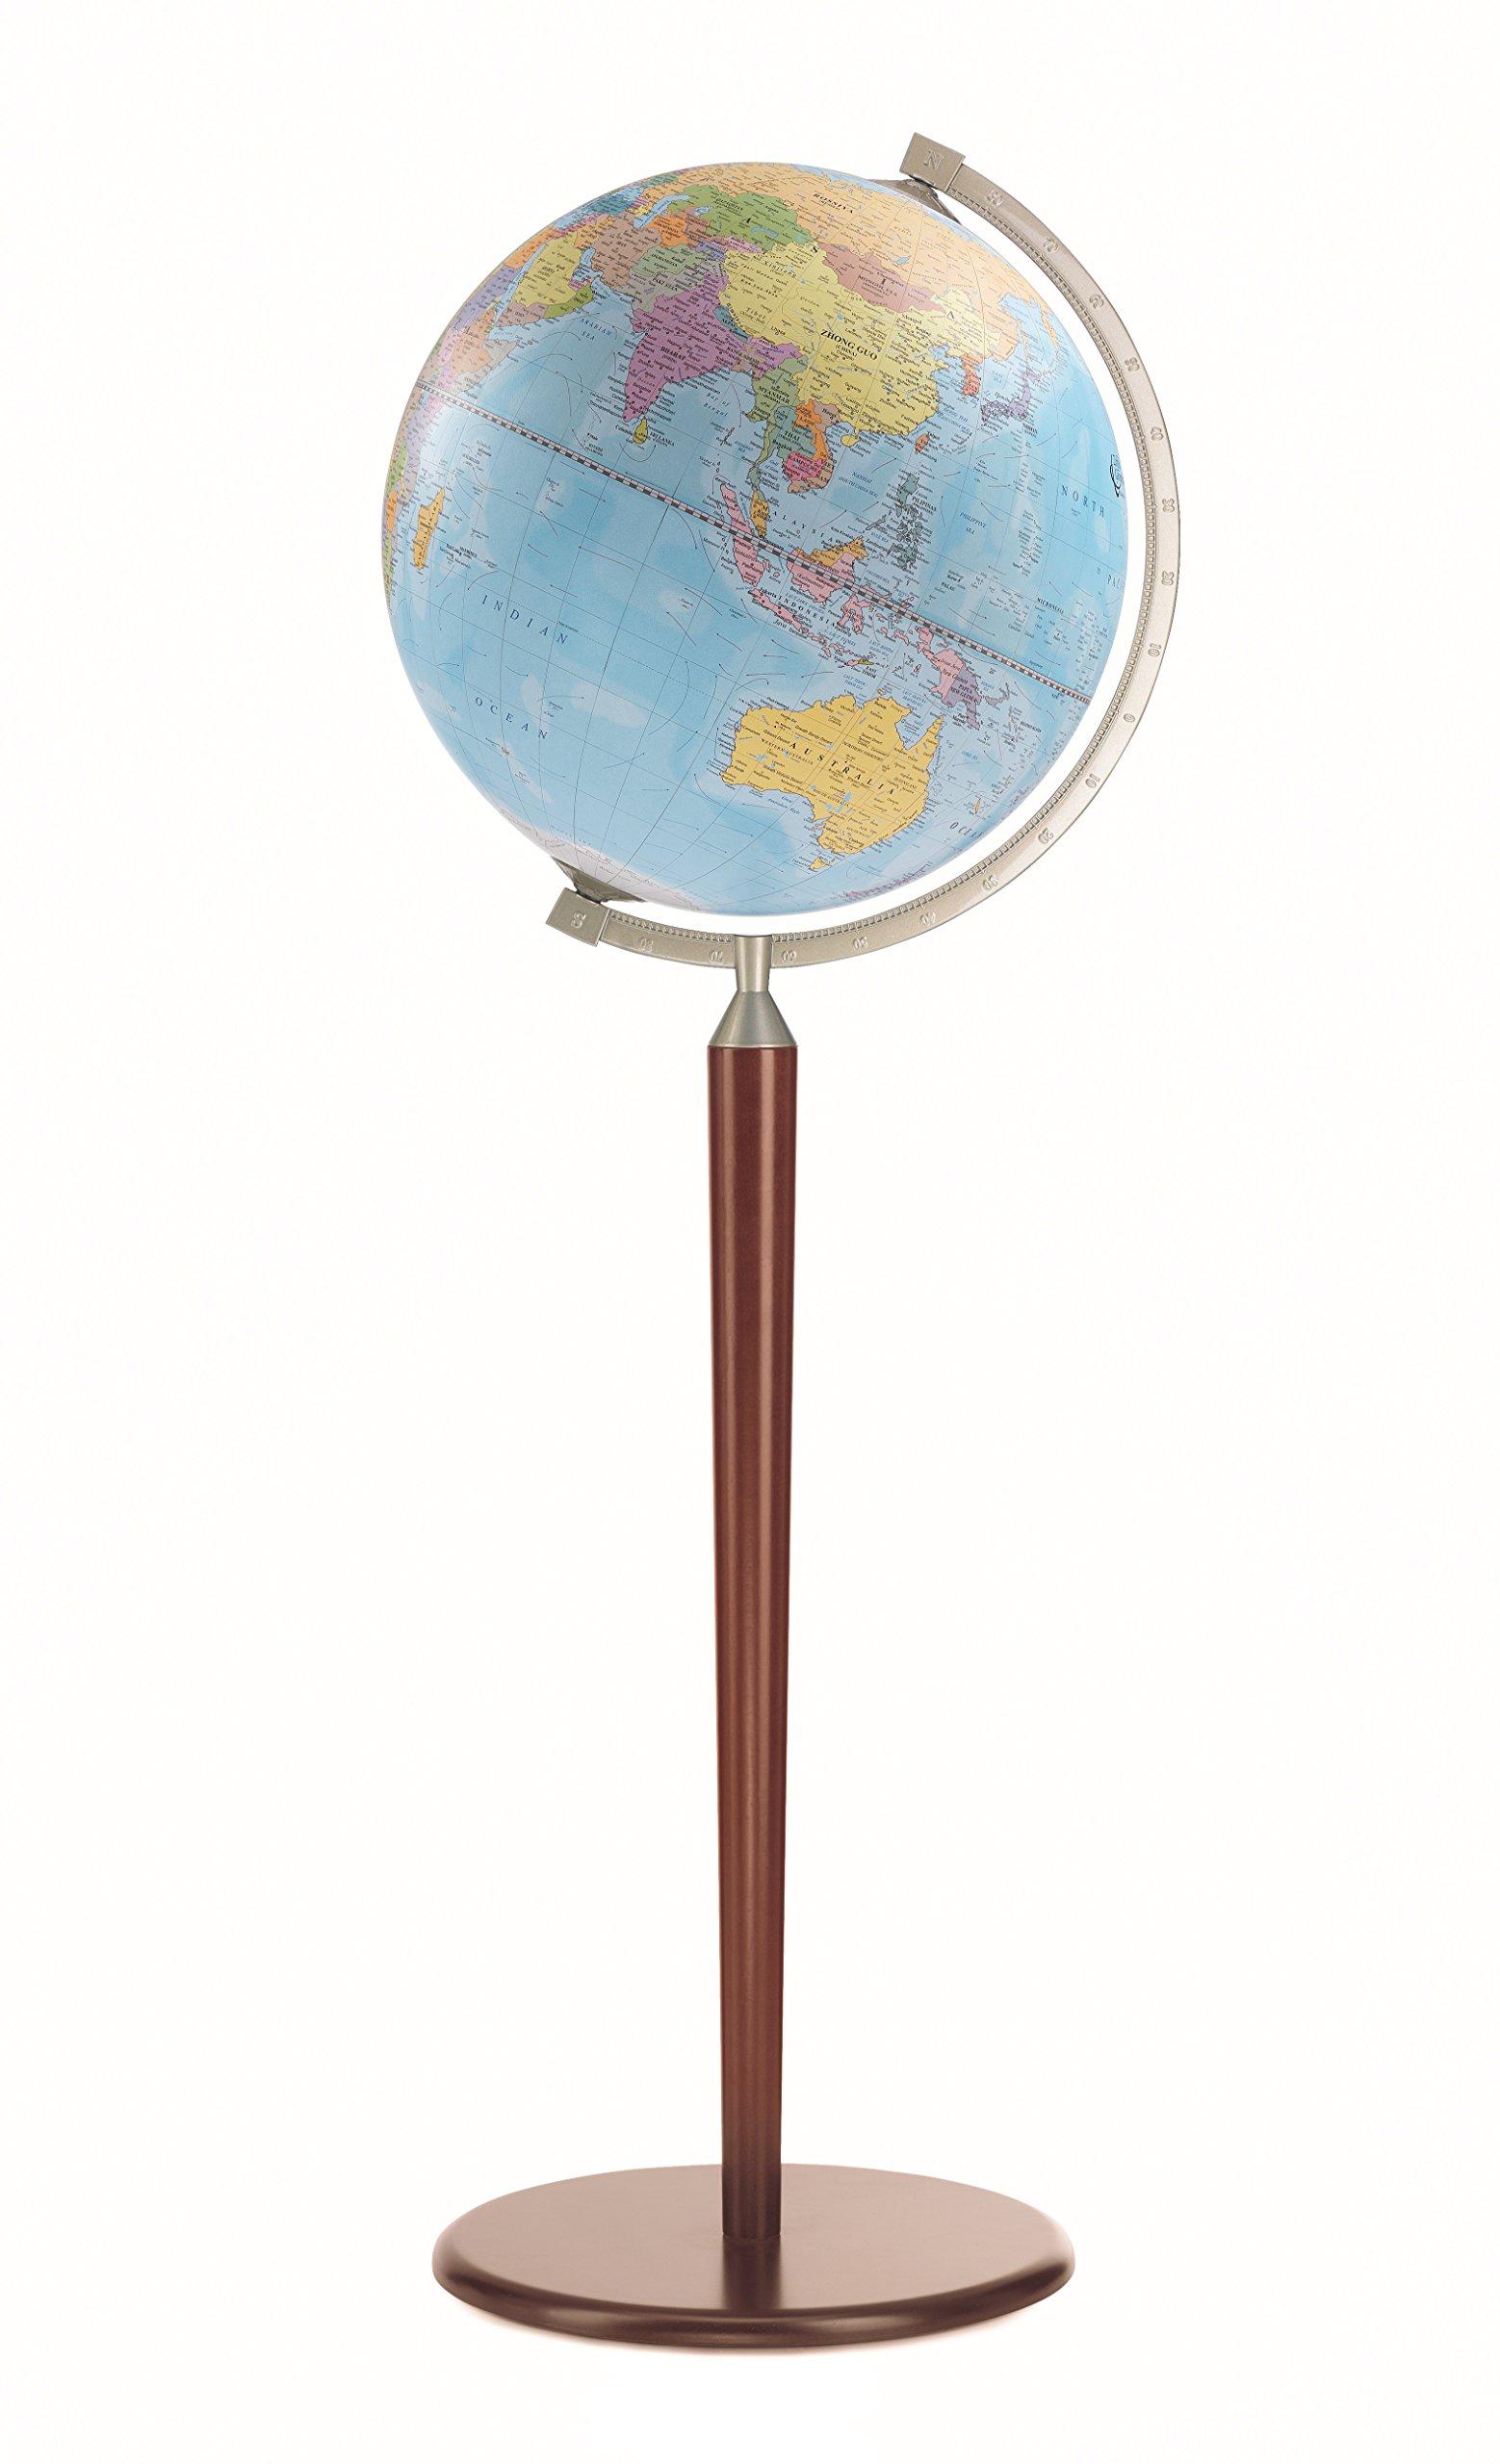 Zoffoli 16'' Vasco da Gama Floor Globe (Dark Stand)